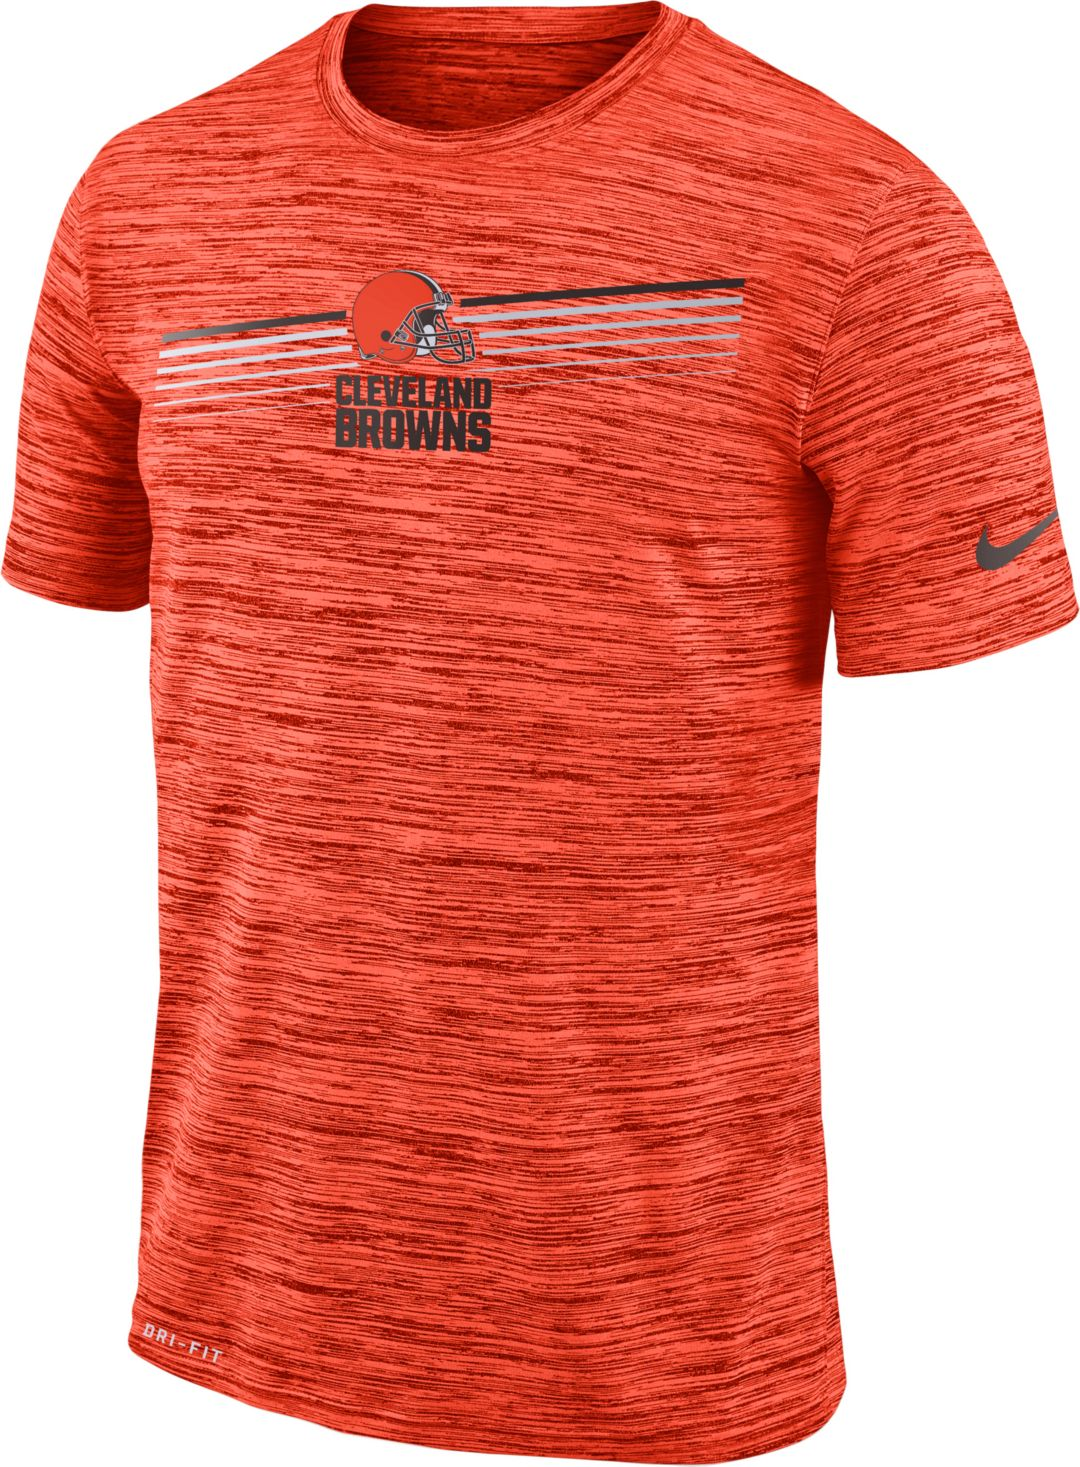 7e2f0288 Nike Men's Cleveland Browns Sideline Legend Velocity Orange T-Shirt